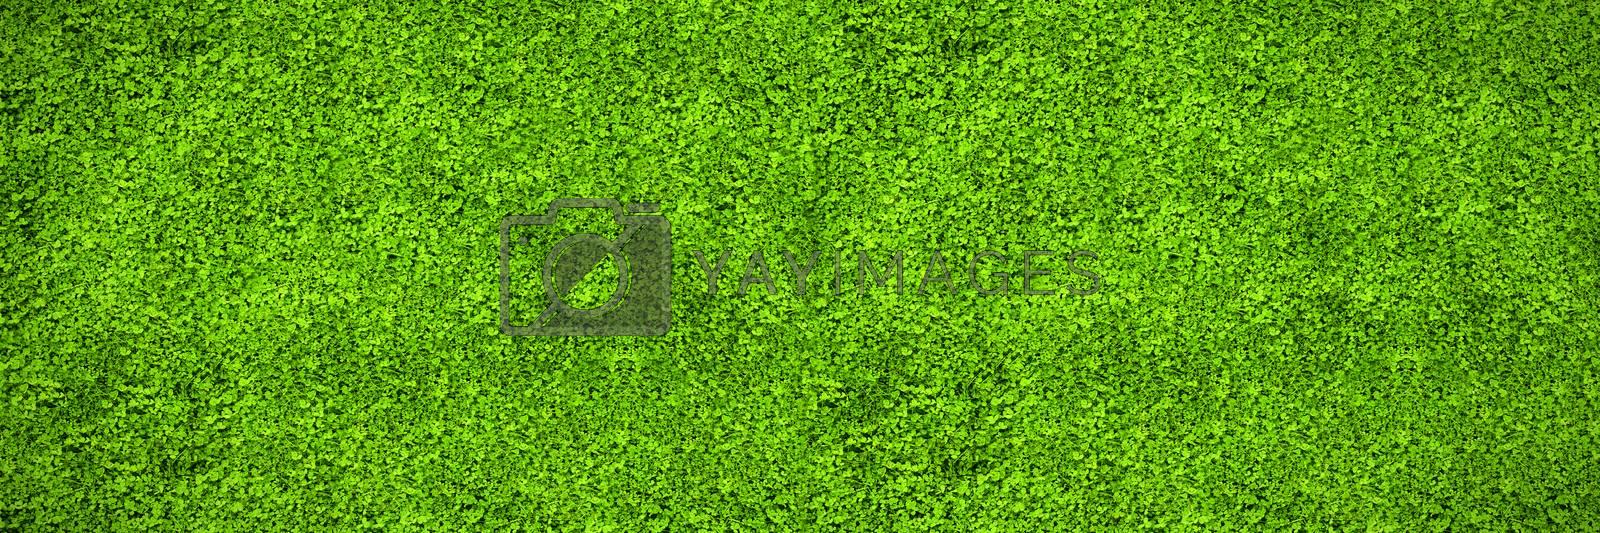 Astro turf surface by Wavebreakmedia